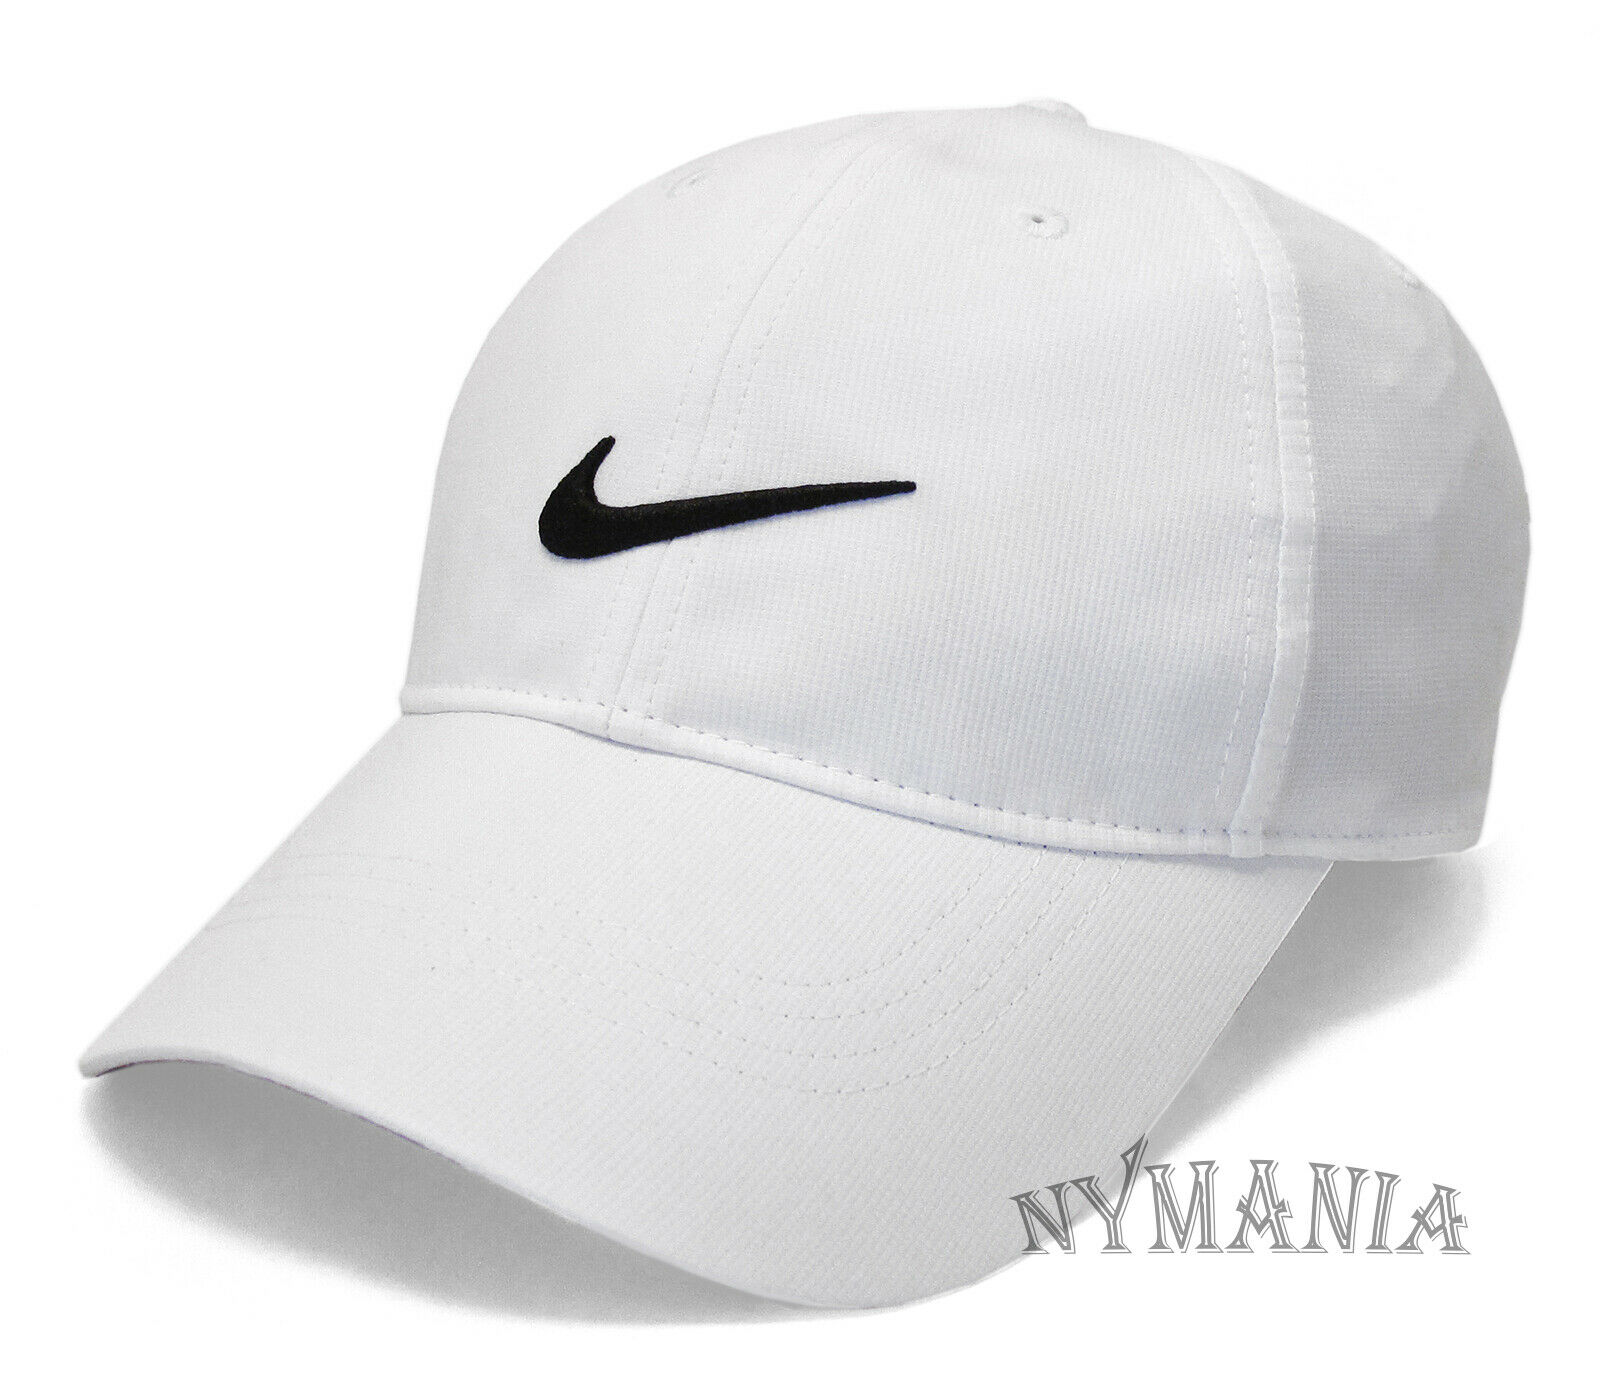 NIKE GOLF Unisex Legacy91 Tech Cap/Hat - Adjustable - White